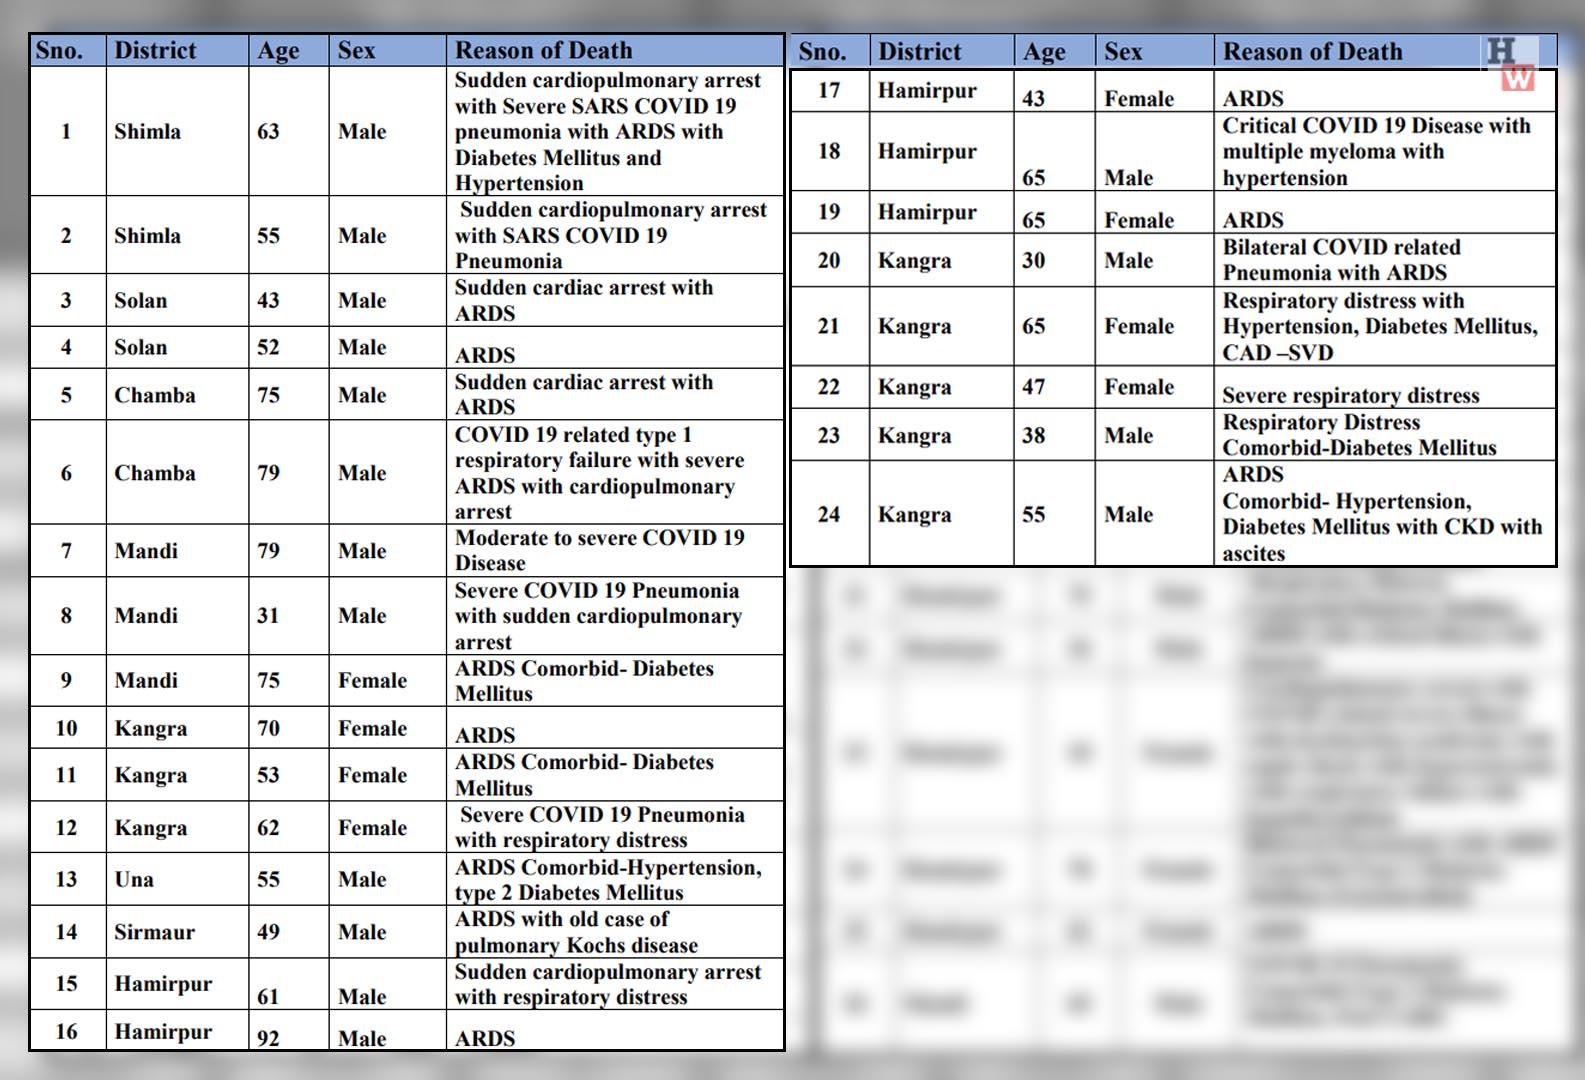 Daily COVID-19 deaths in Himachal PRadesh on apirl 24, 2021